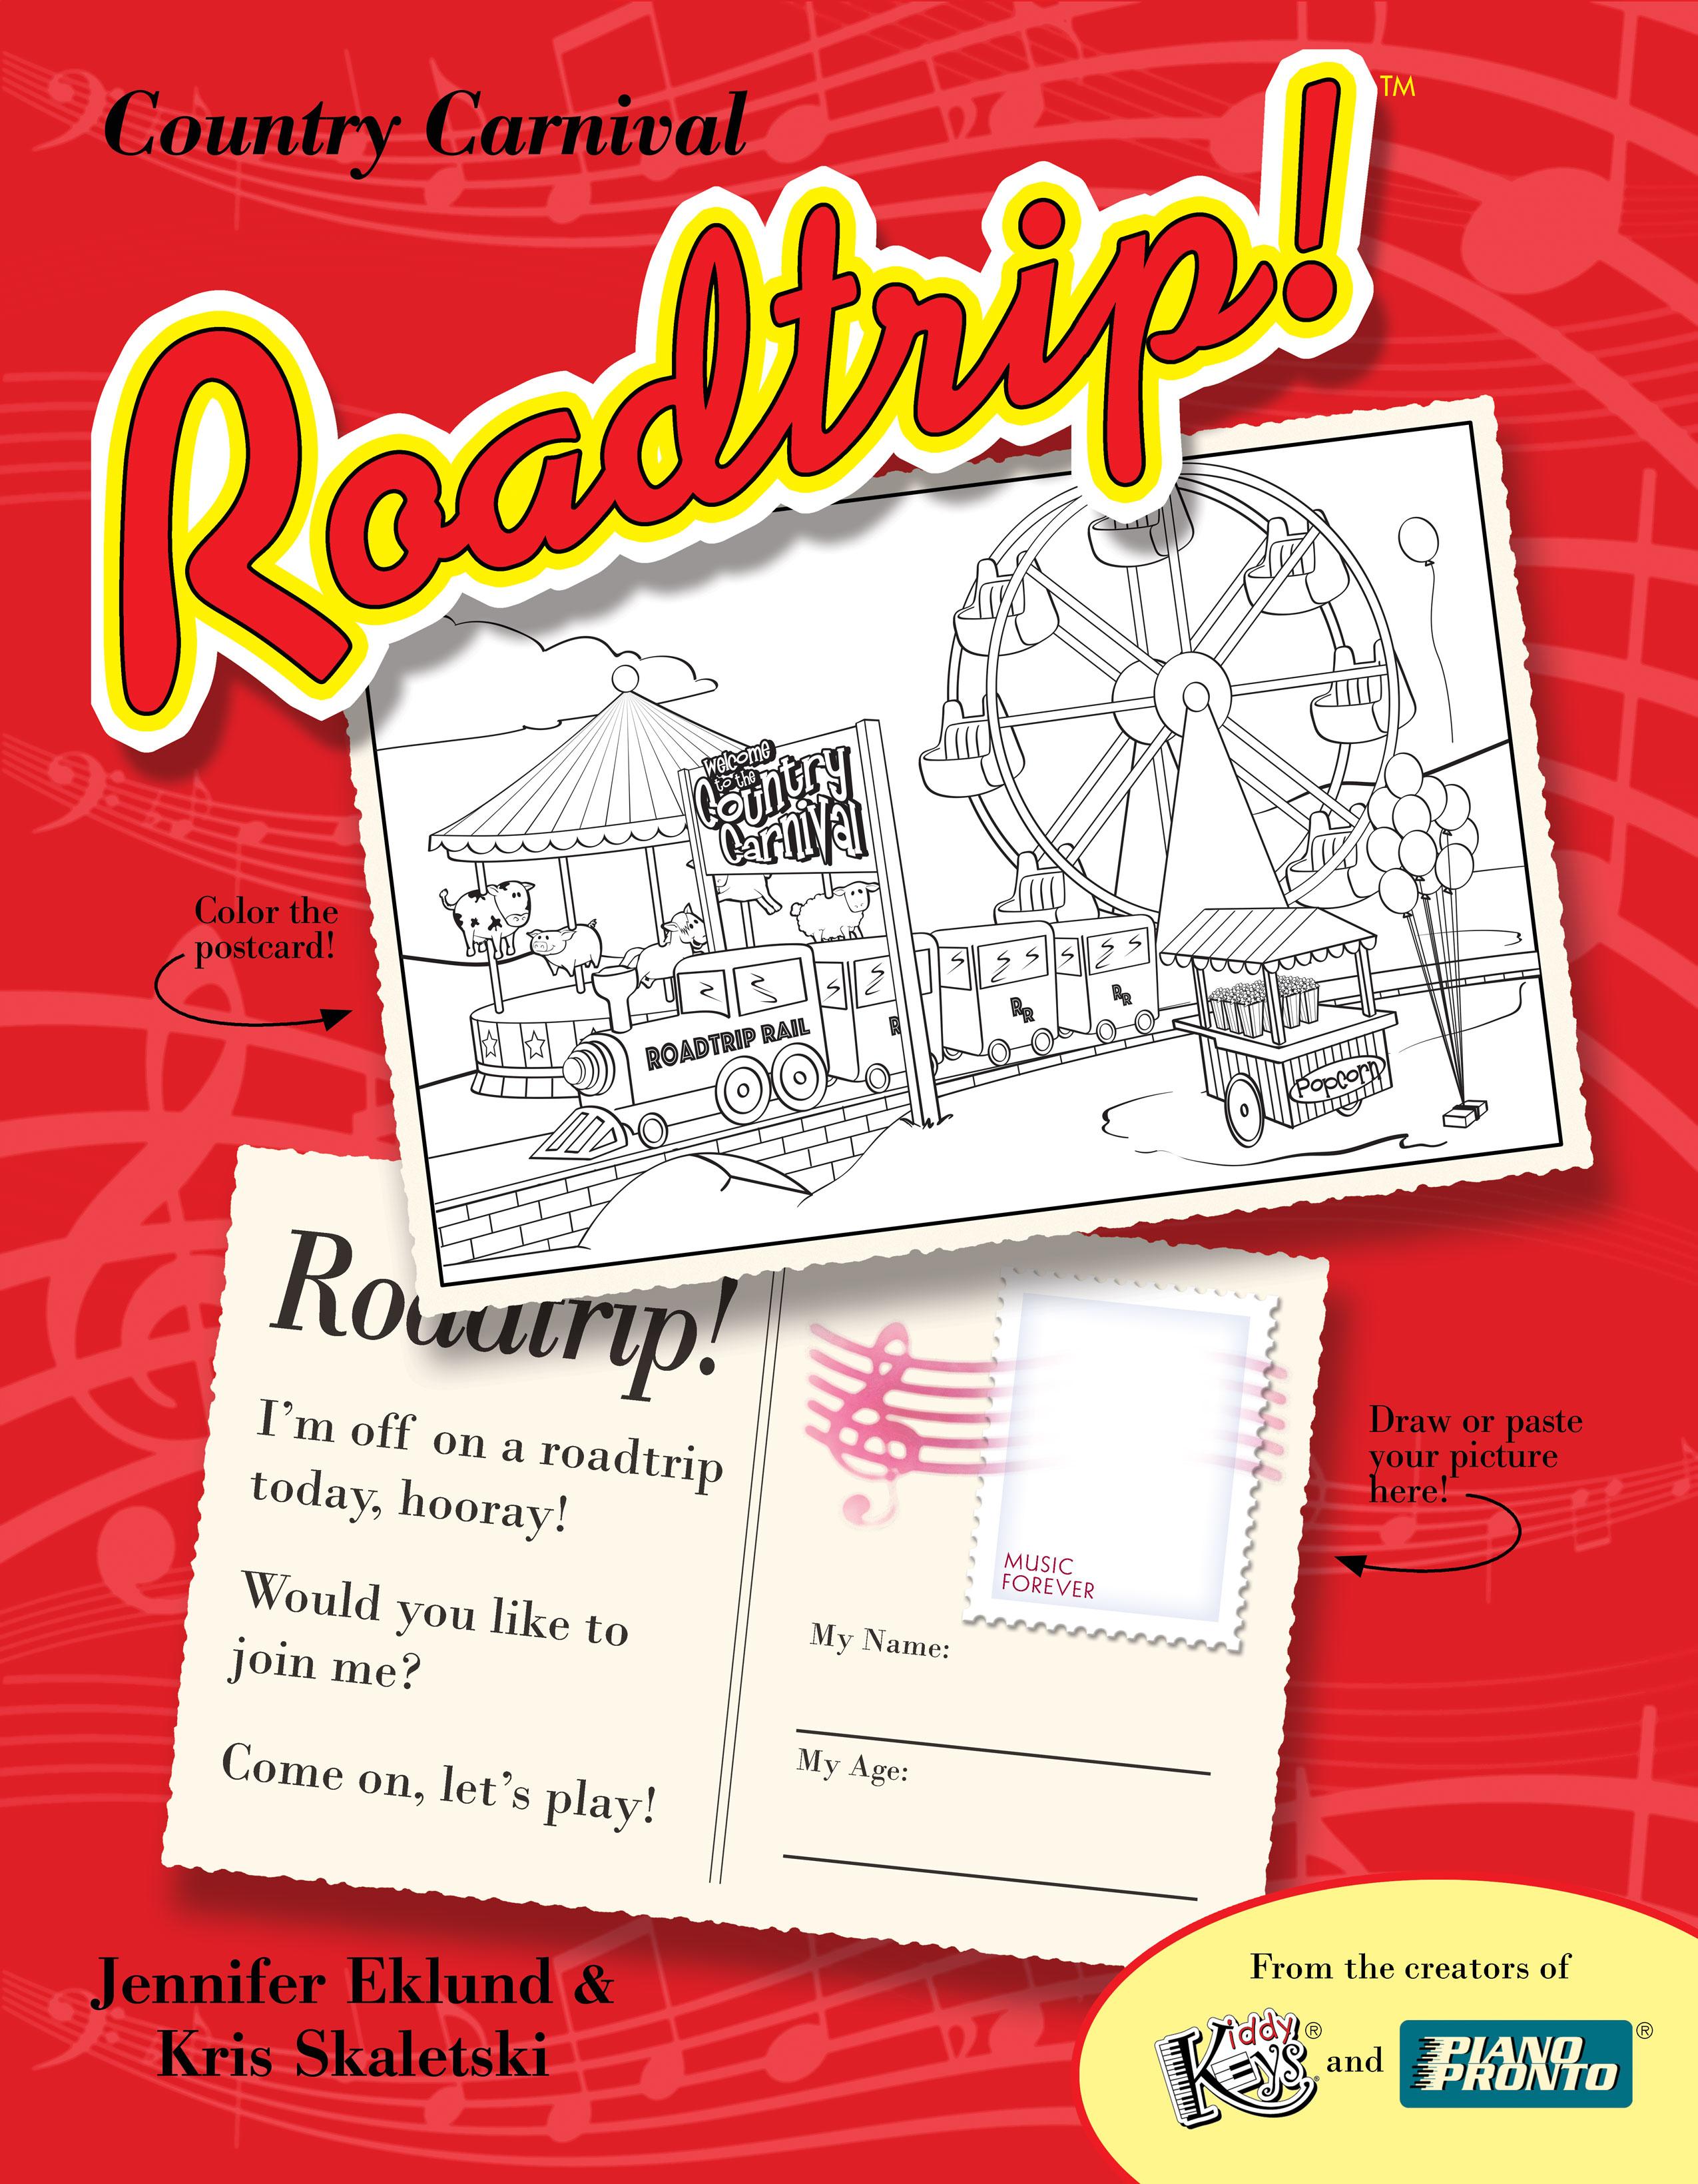 Roadtrip | Piano For Preschoolers | Chesser Music Stuido | Creative Piano Lessons in Lakeland, FL | Susan Chesser Piano Teacher